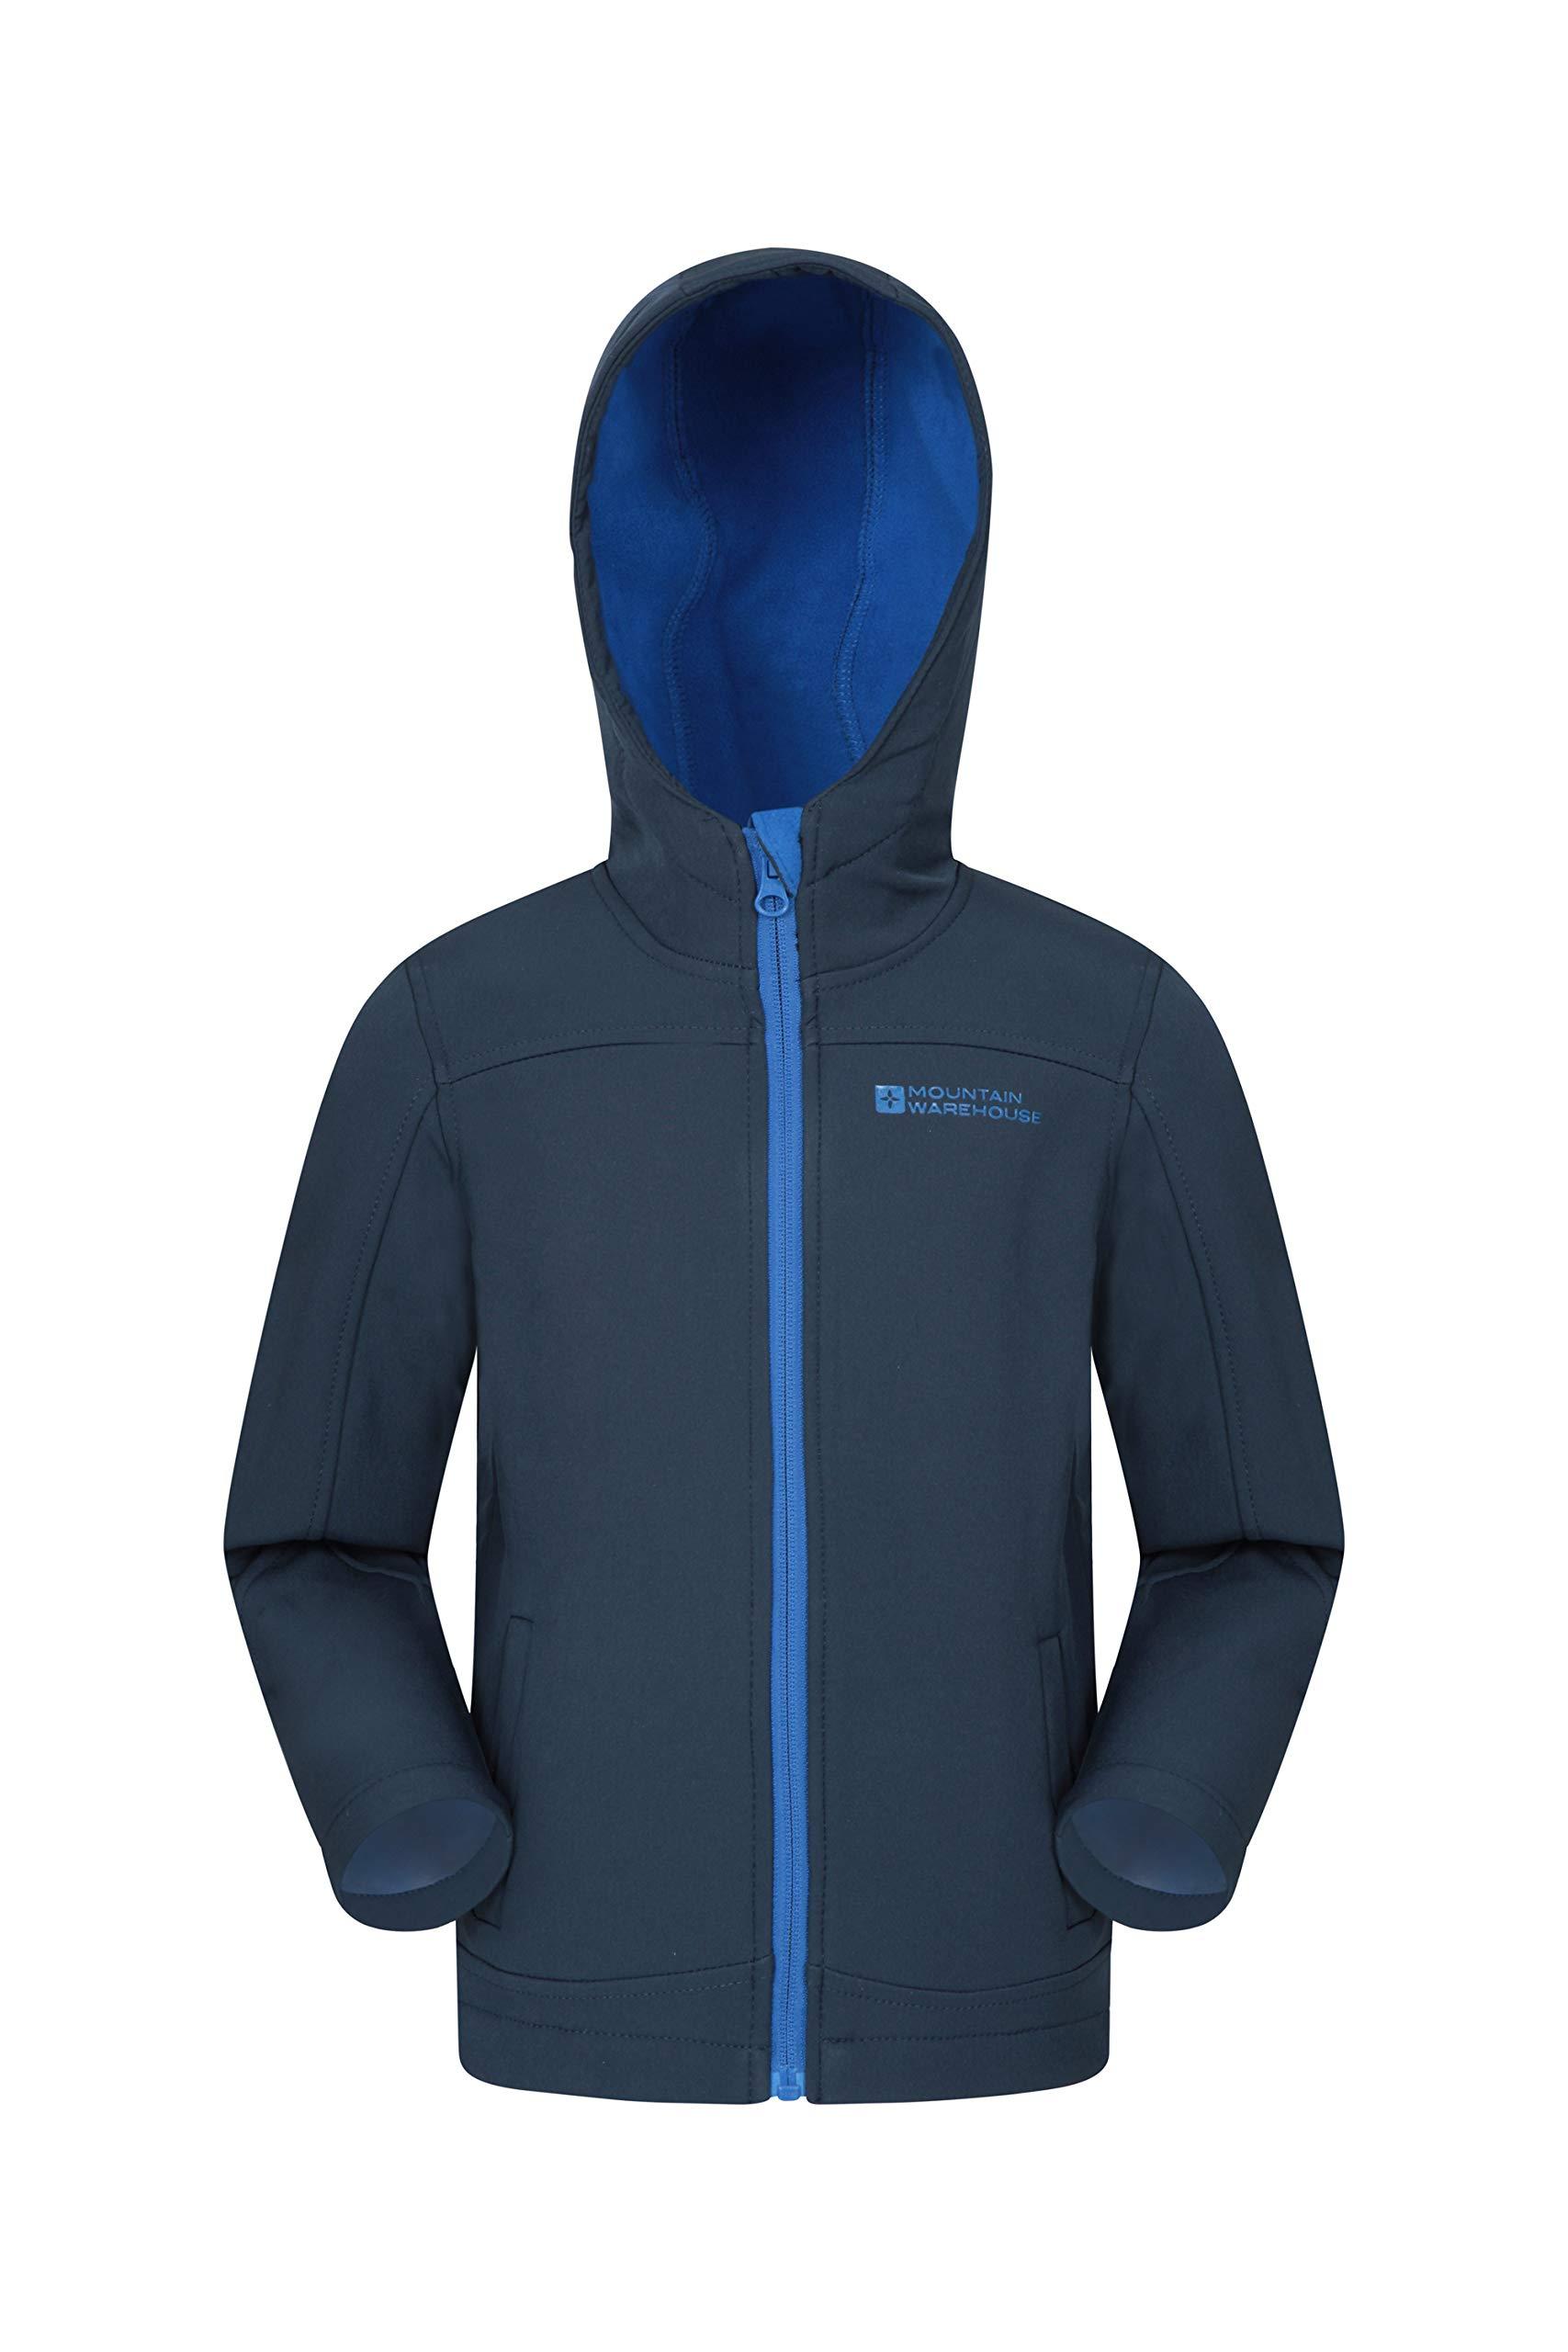 Mountain Warehouse Exodus Kids Softshell Jacket -Wind Resistant Shell Navy 5-6 Years